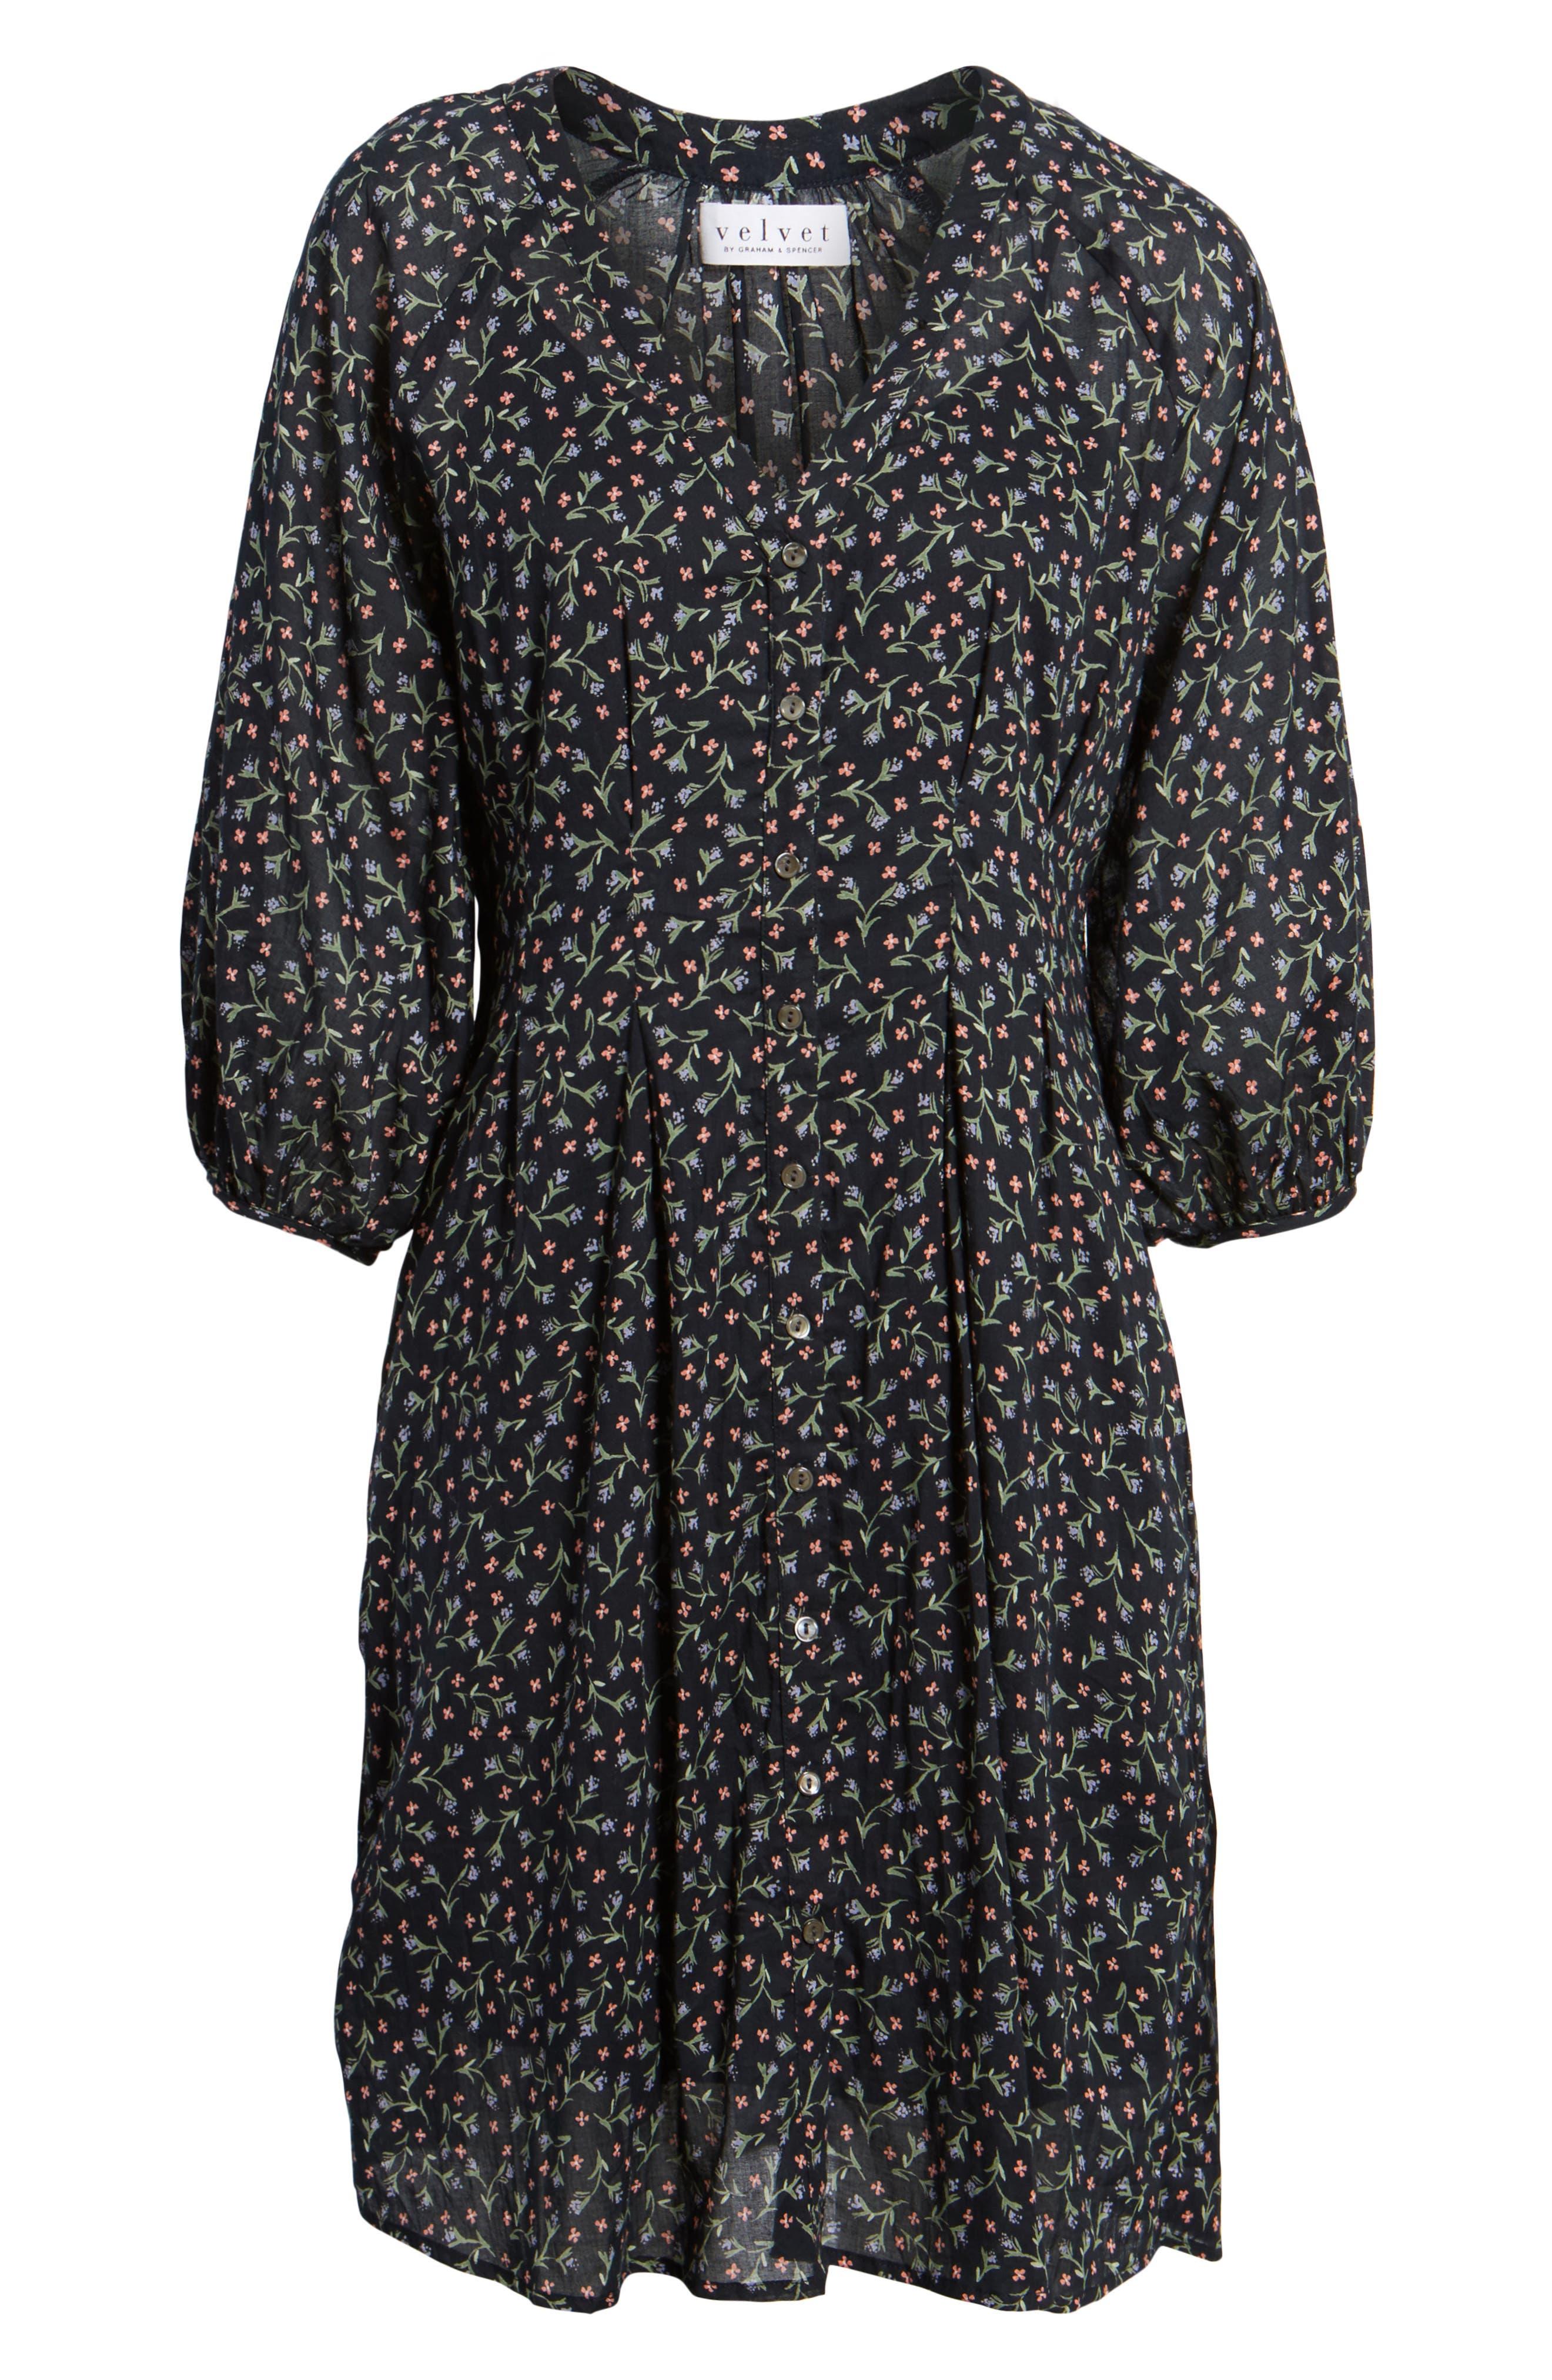 Printed Cotton Voile Dress,                             Alternate thumbnail 6, color,                             005